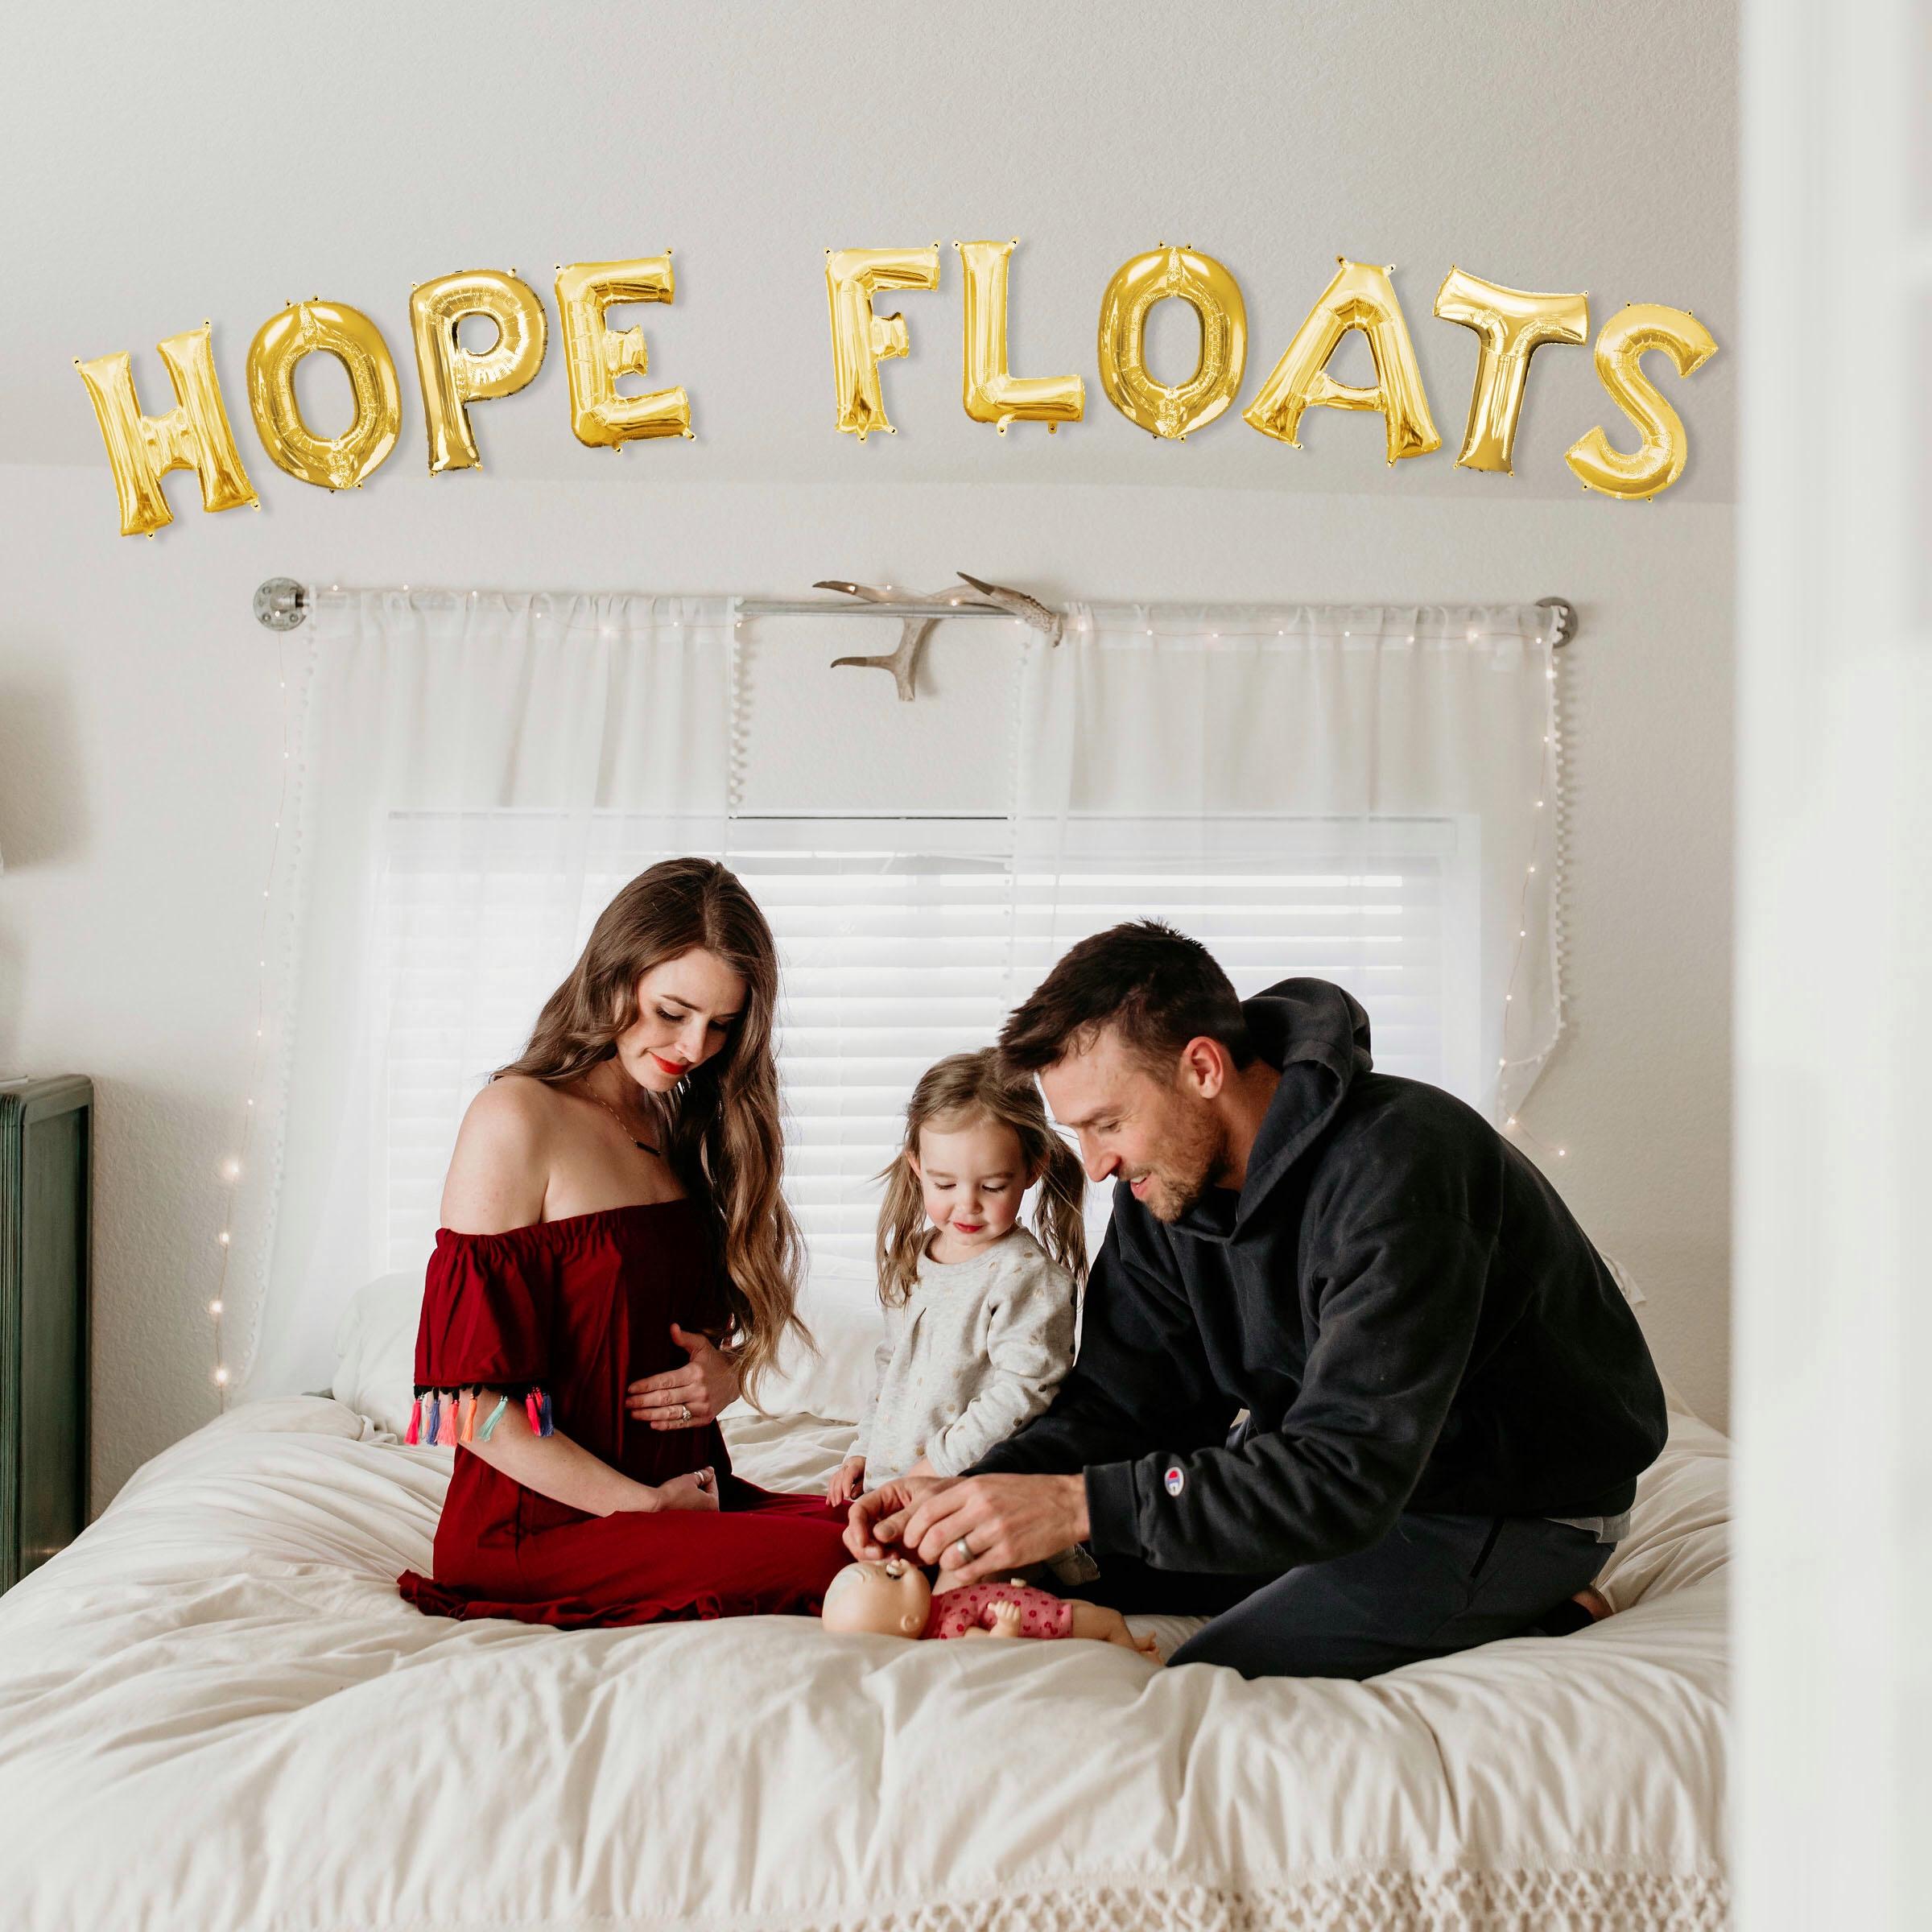 hope floats 2.jpg